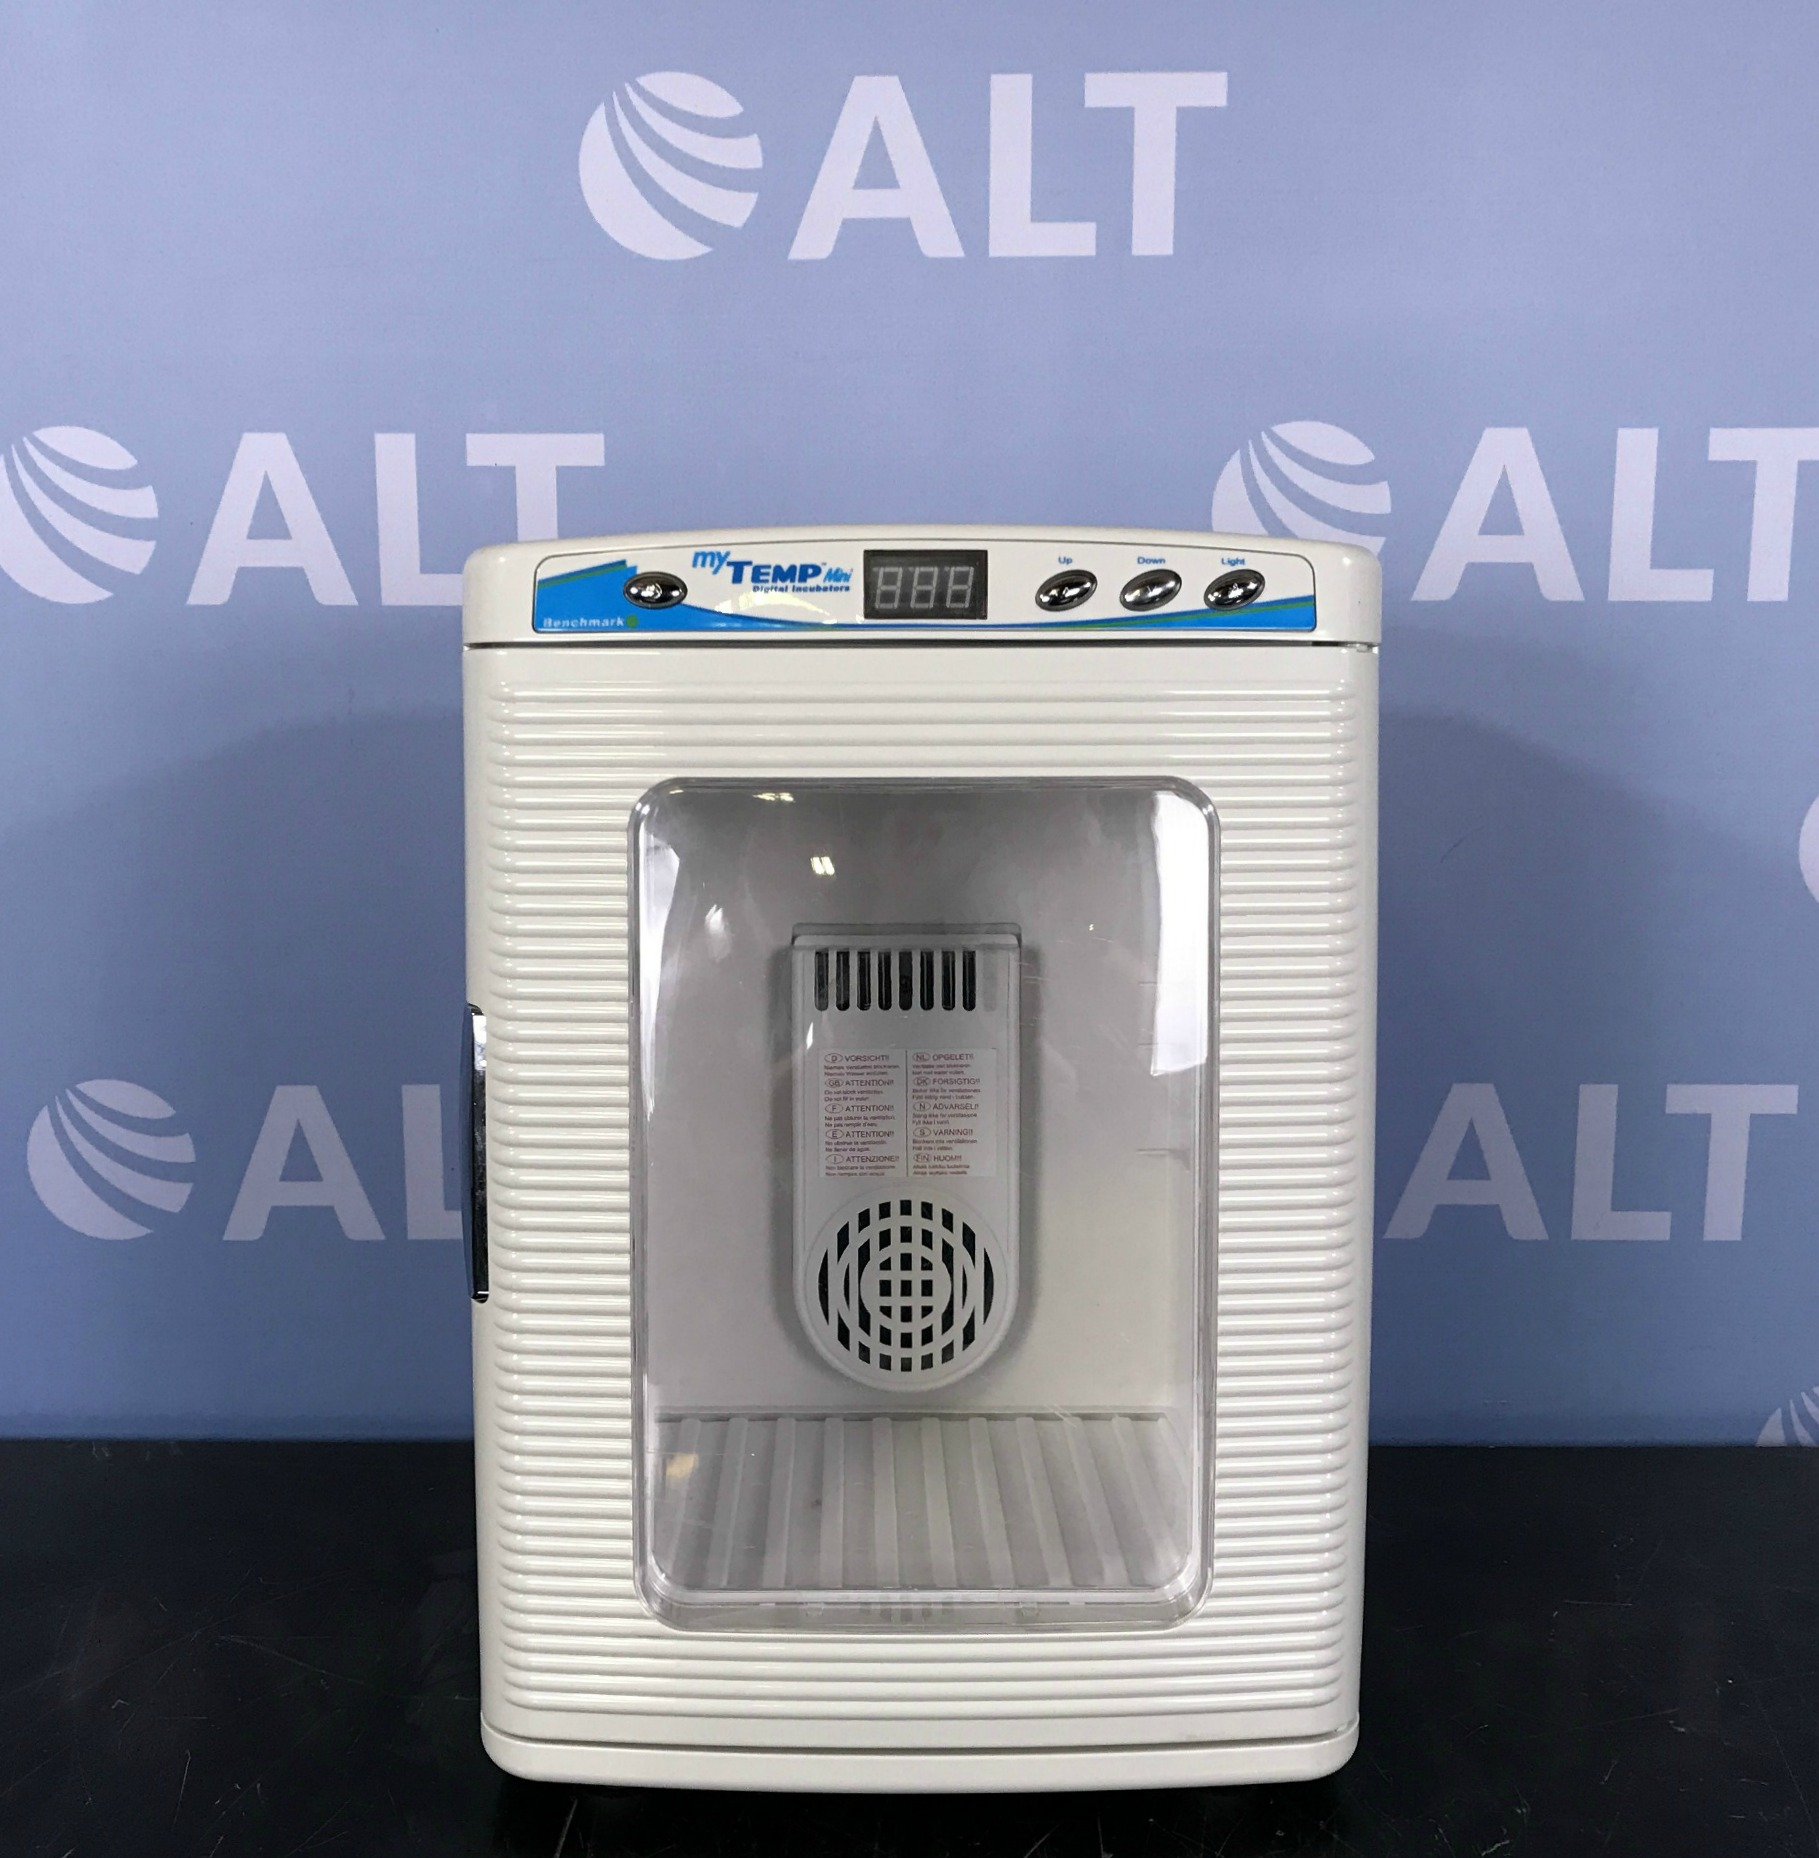 Benchmark Scientific MyTemp Mini Digital Incubator Model H2200-H Image